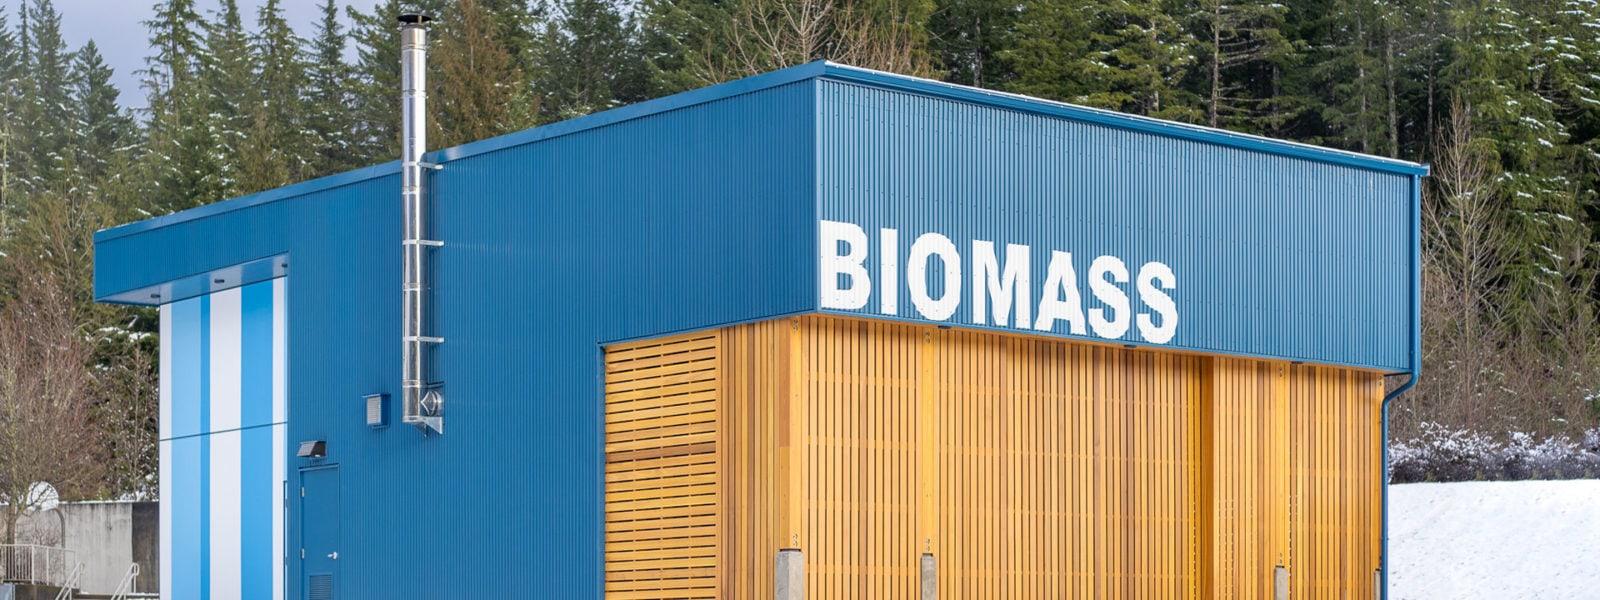 Don Ross Biomass Plant by studioHuB architects